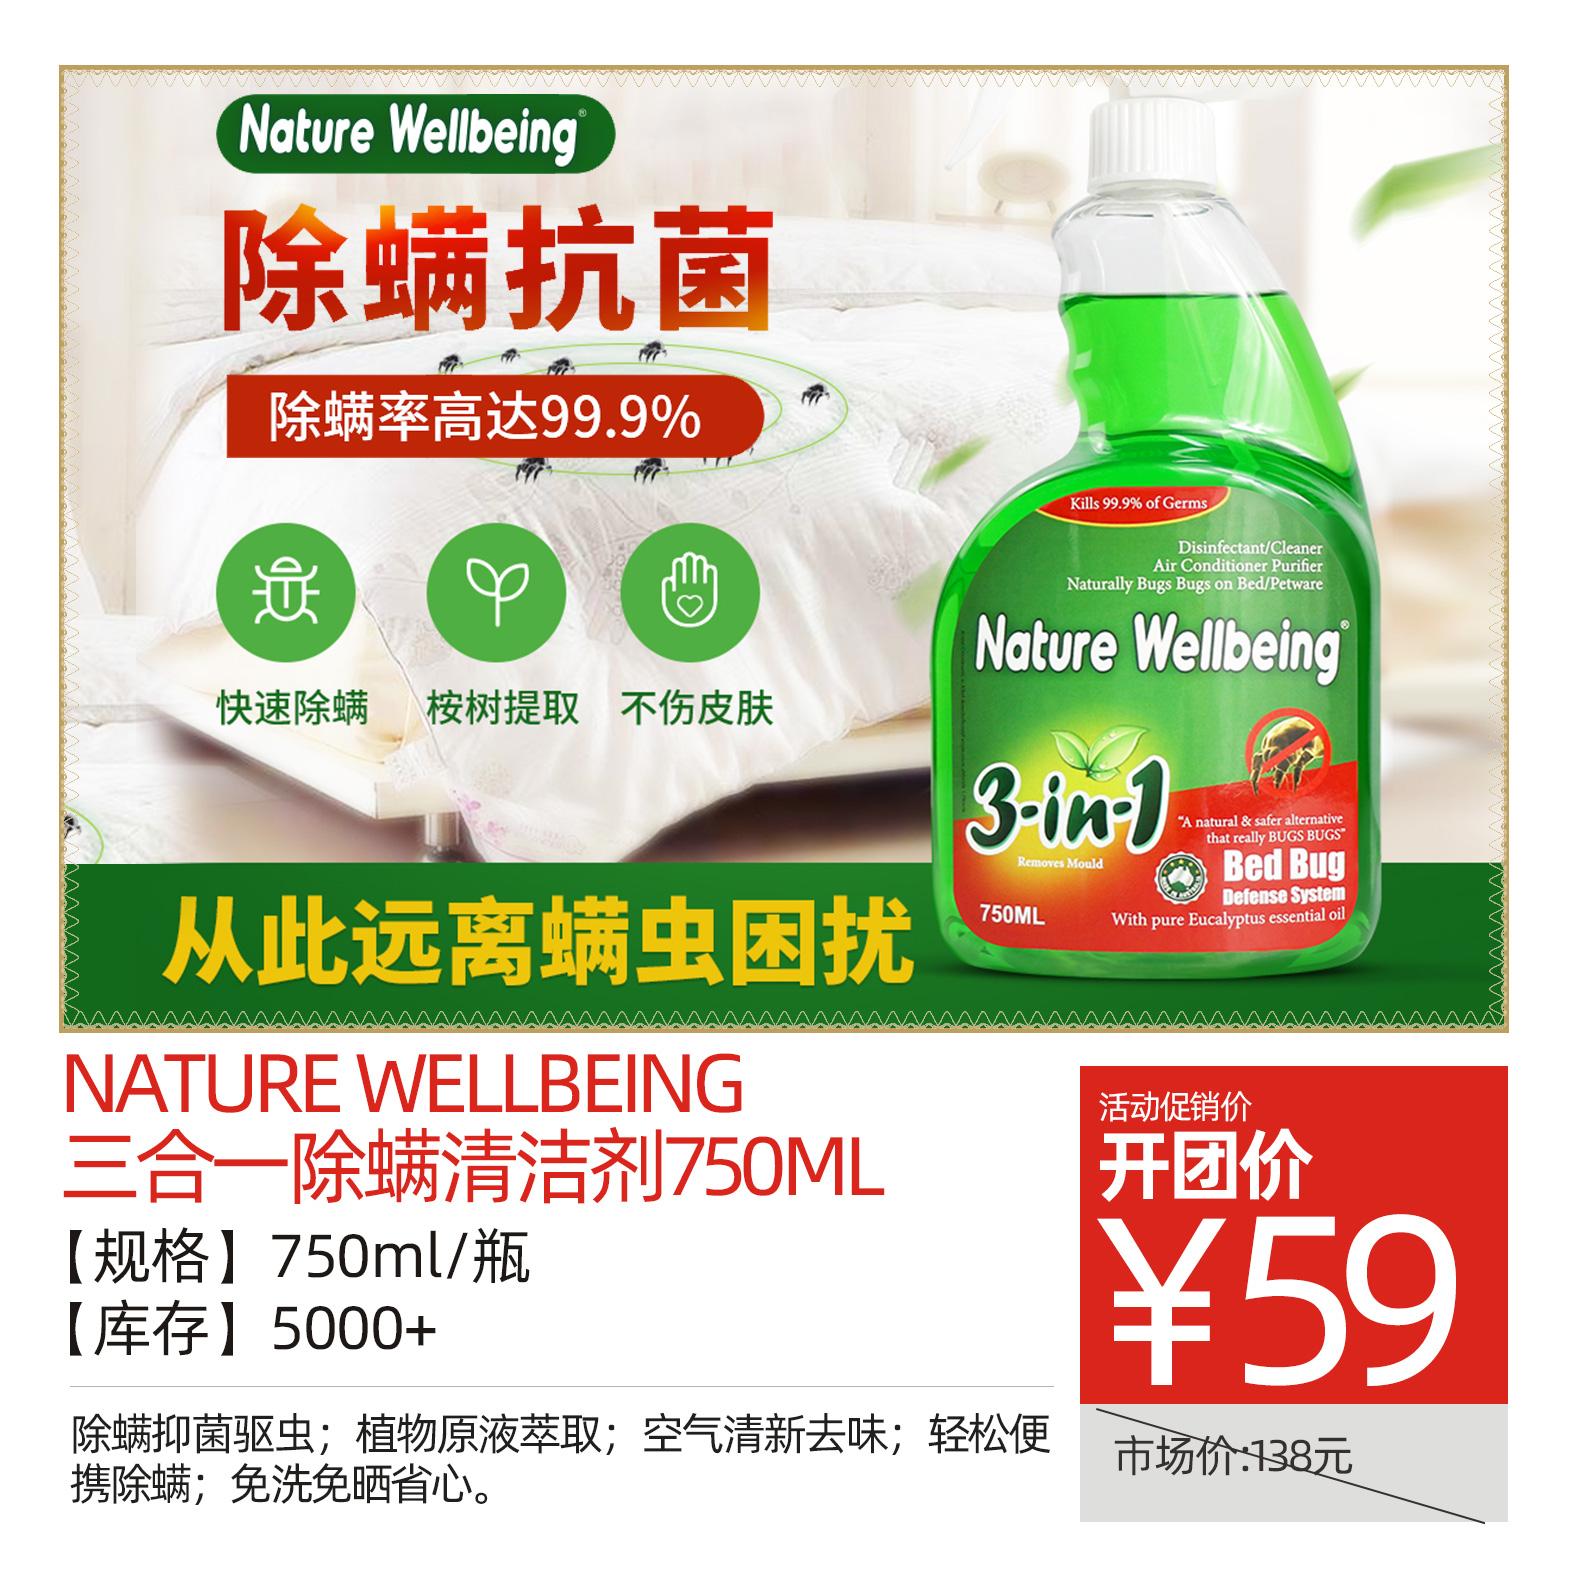 nature wellbeing三合一除螨清洁剂750ml一瓶装